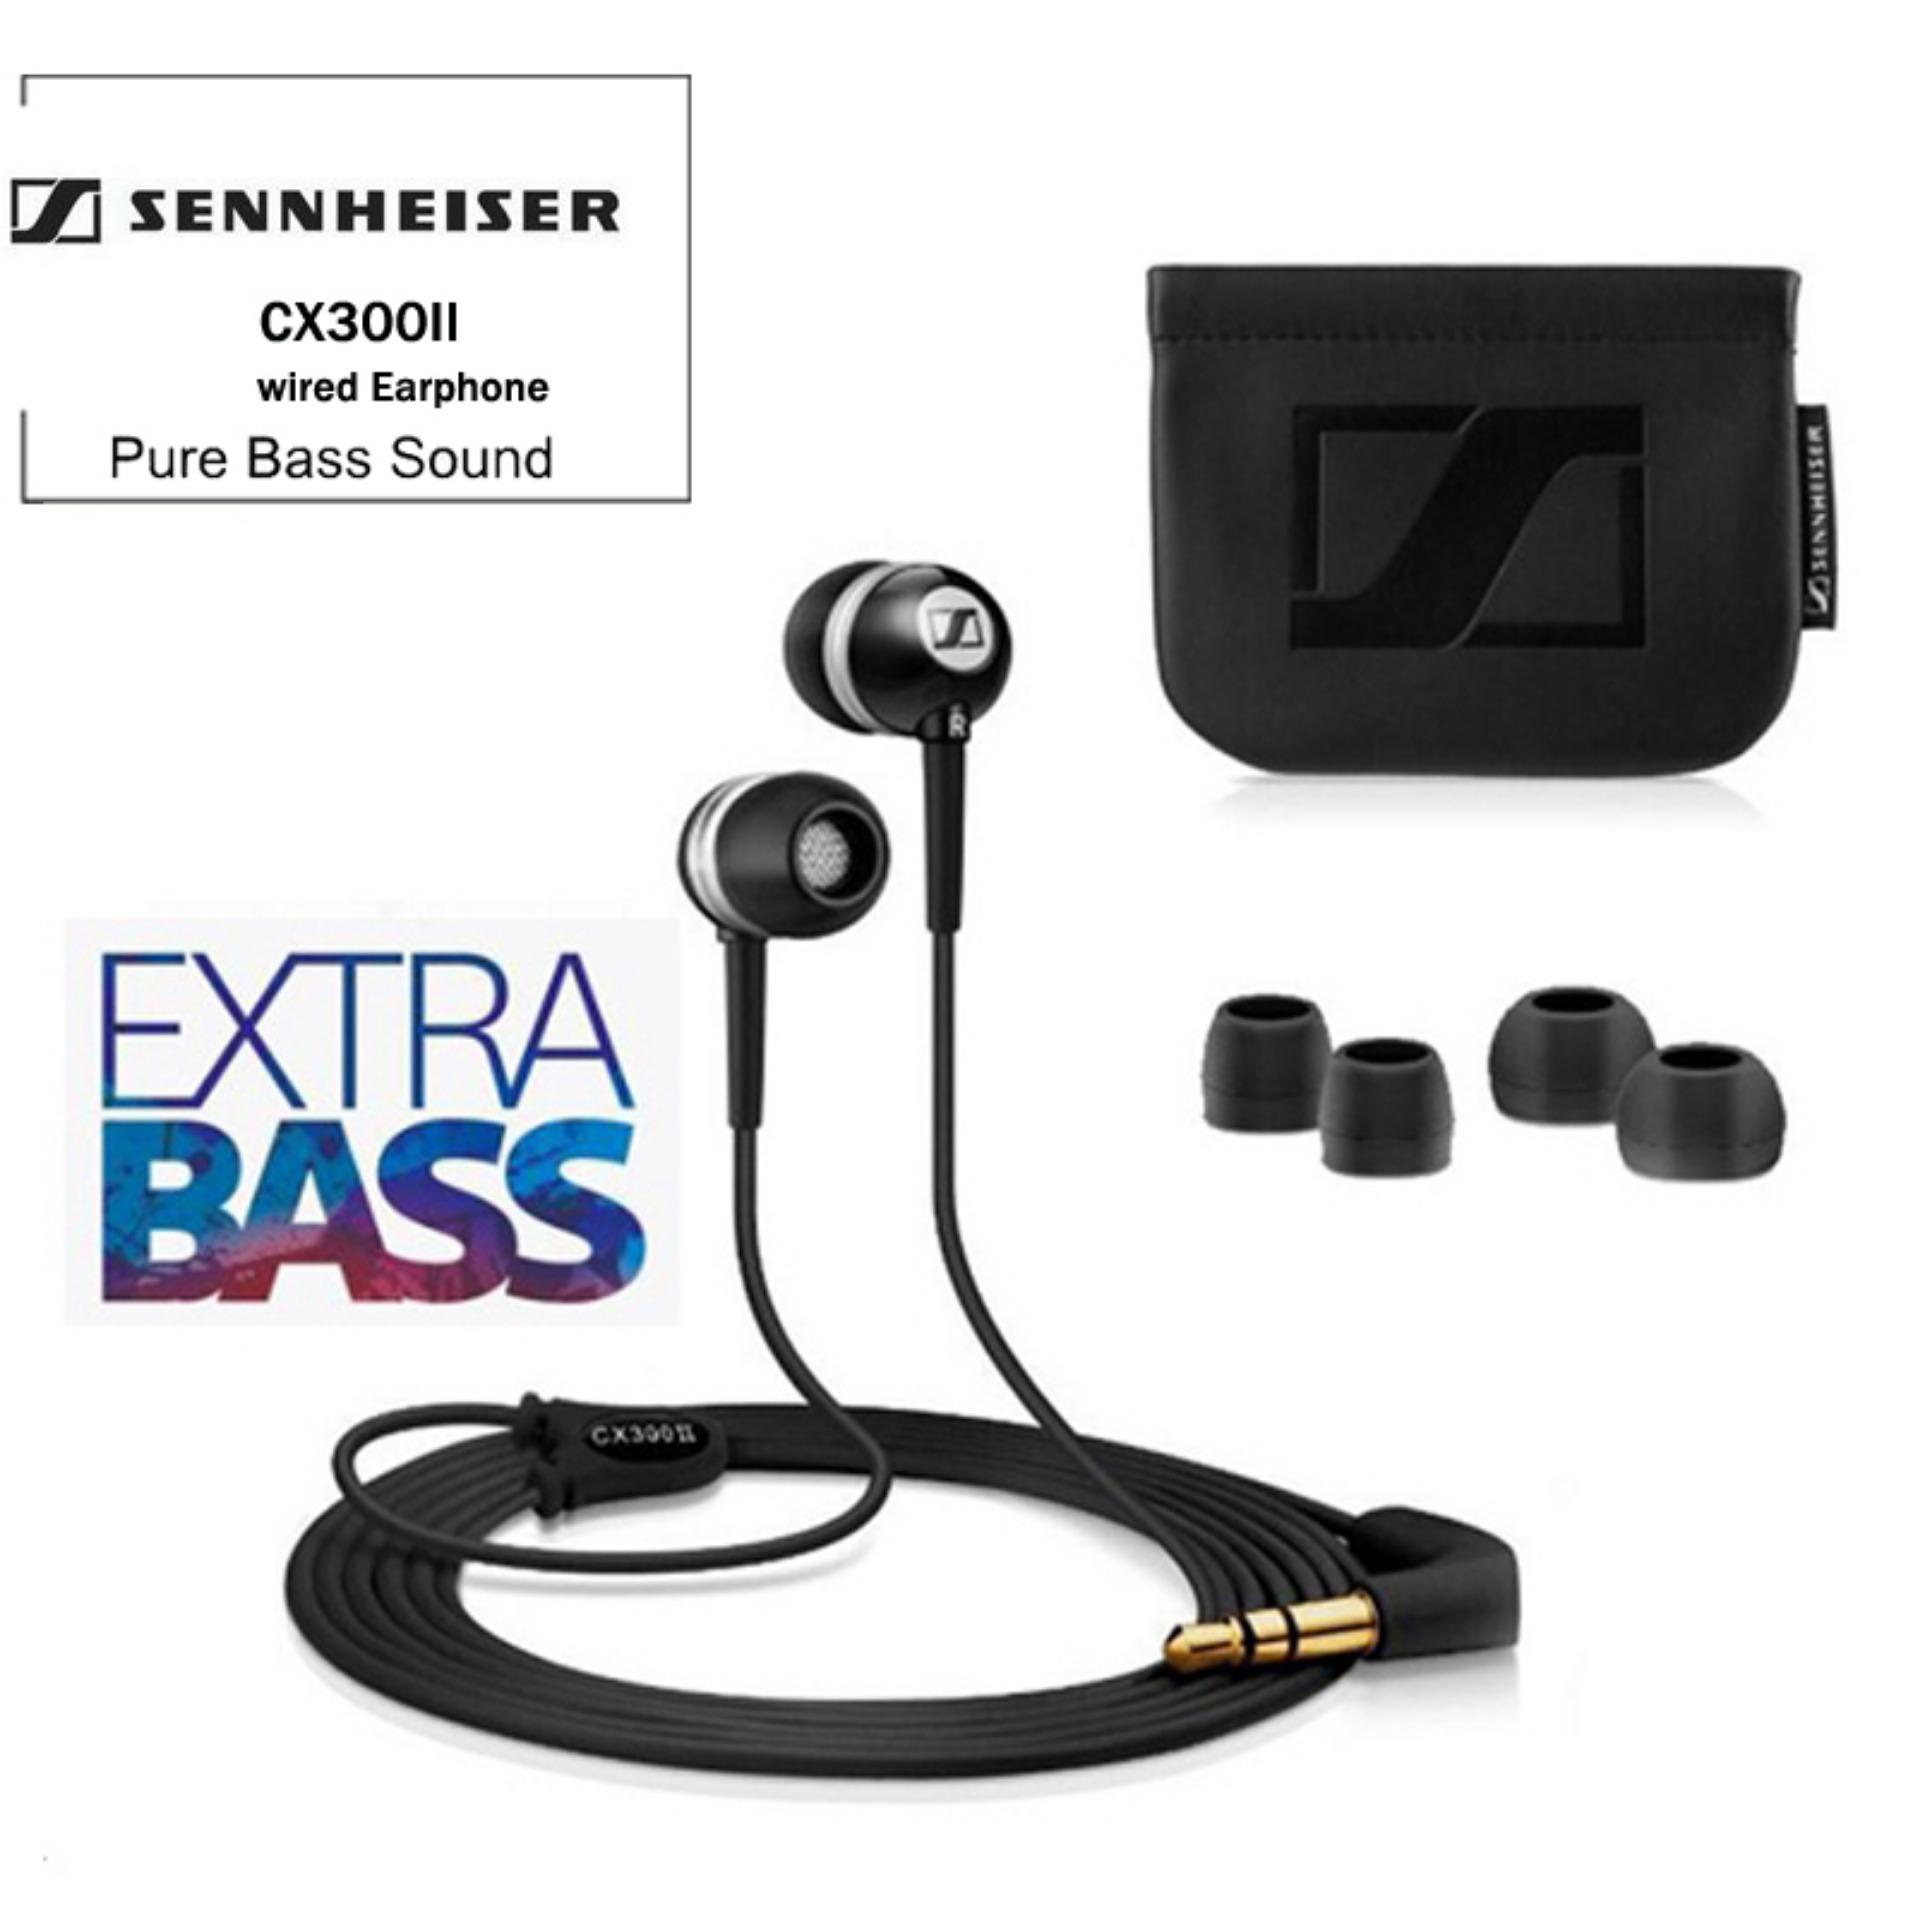 beaee996efb CX300 II CX 300 II Precision Enhanced Bass Earbuds, Black (iOS version)